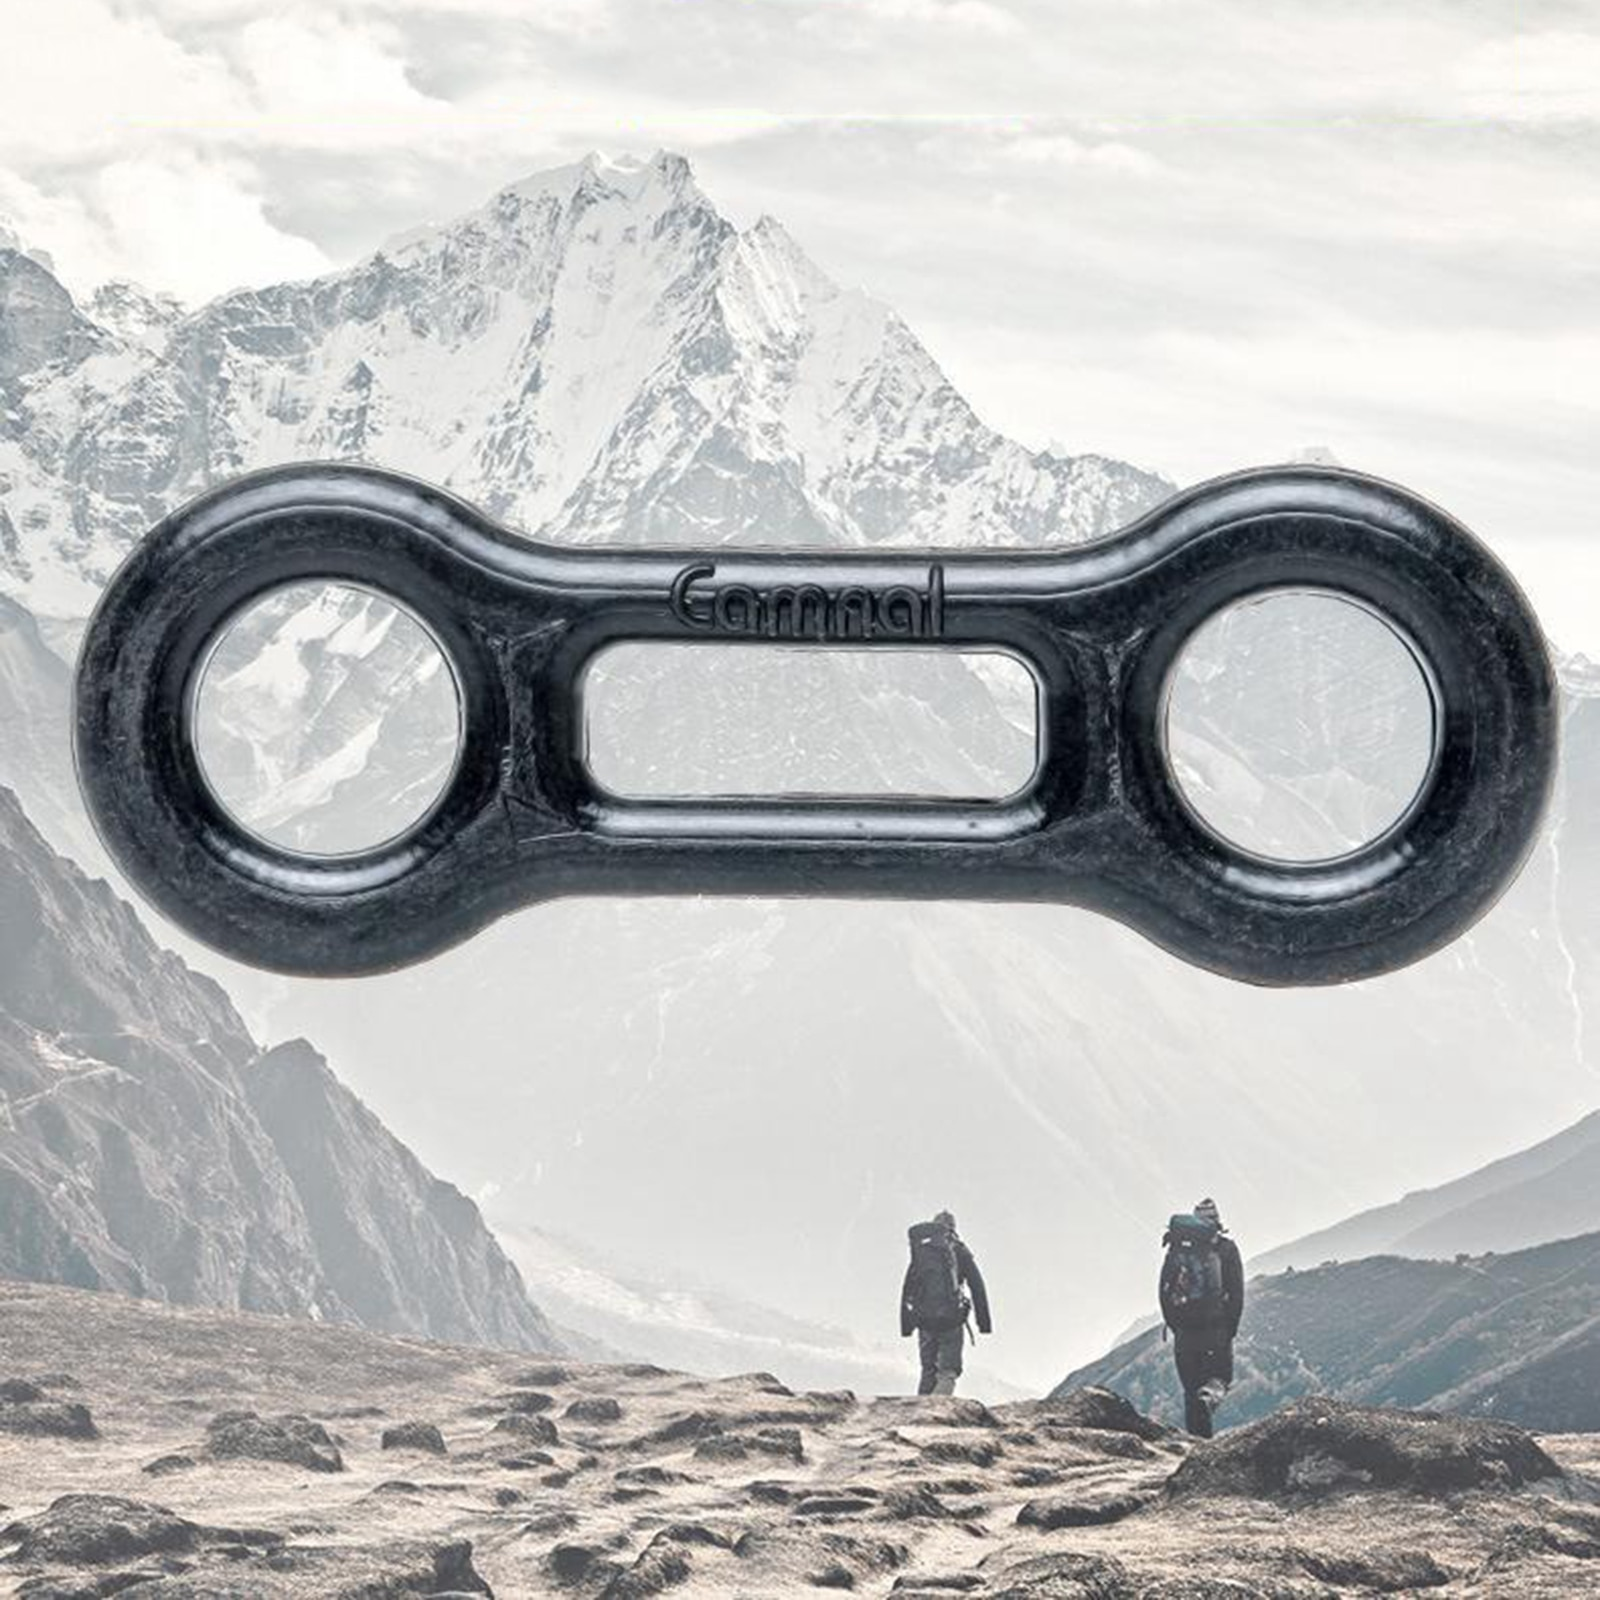 Carabiner Ropes Locking Tools Rigging Fixing Rock Climbing Safety  Equipment,